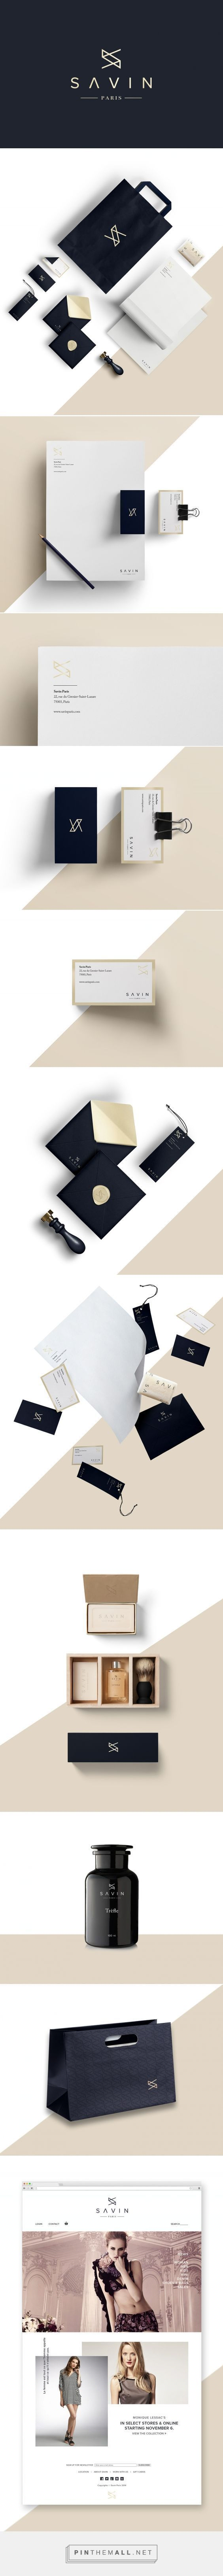 Savin Paris - fashion apparel on Behance - branding stationary corporate identity visual design label business card letterhead bag packaging website enveloppe logo minimalistic graphic design::